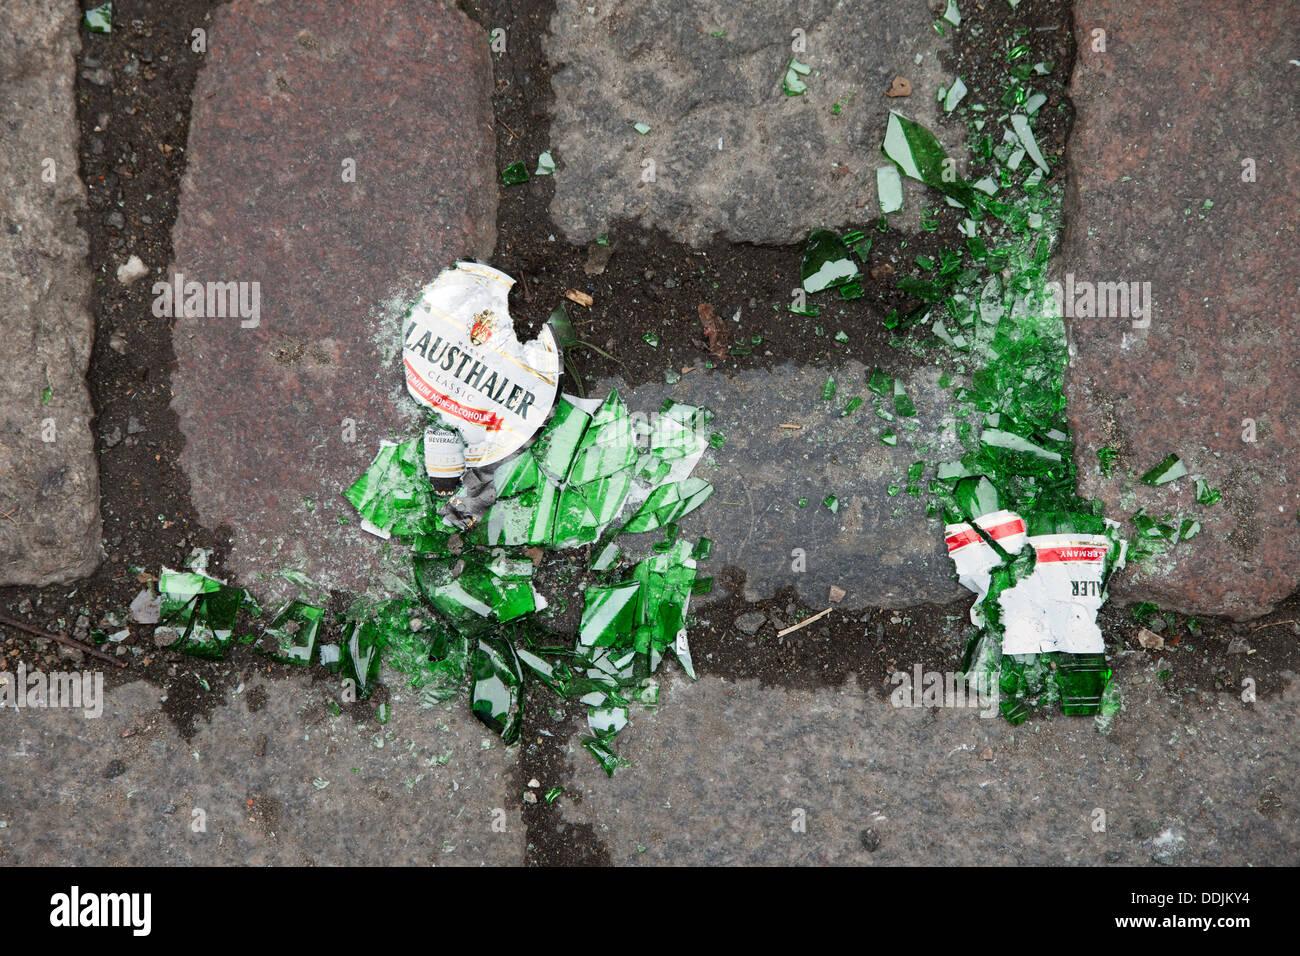 Broken beer bottle - many glass chips dangerous to people walking barefoot - Stock Image